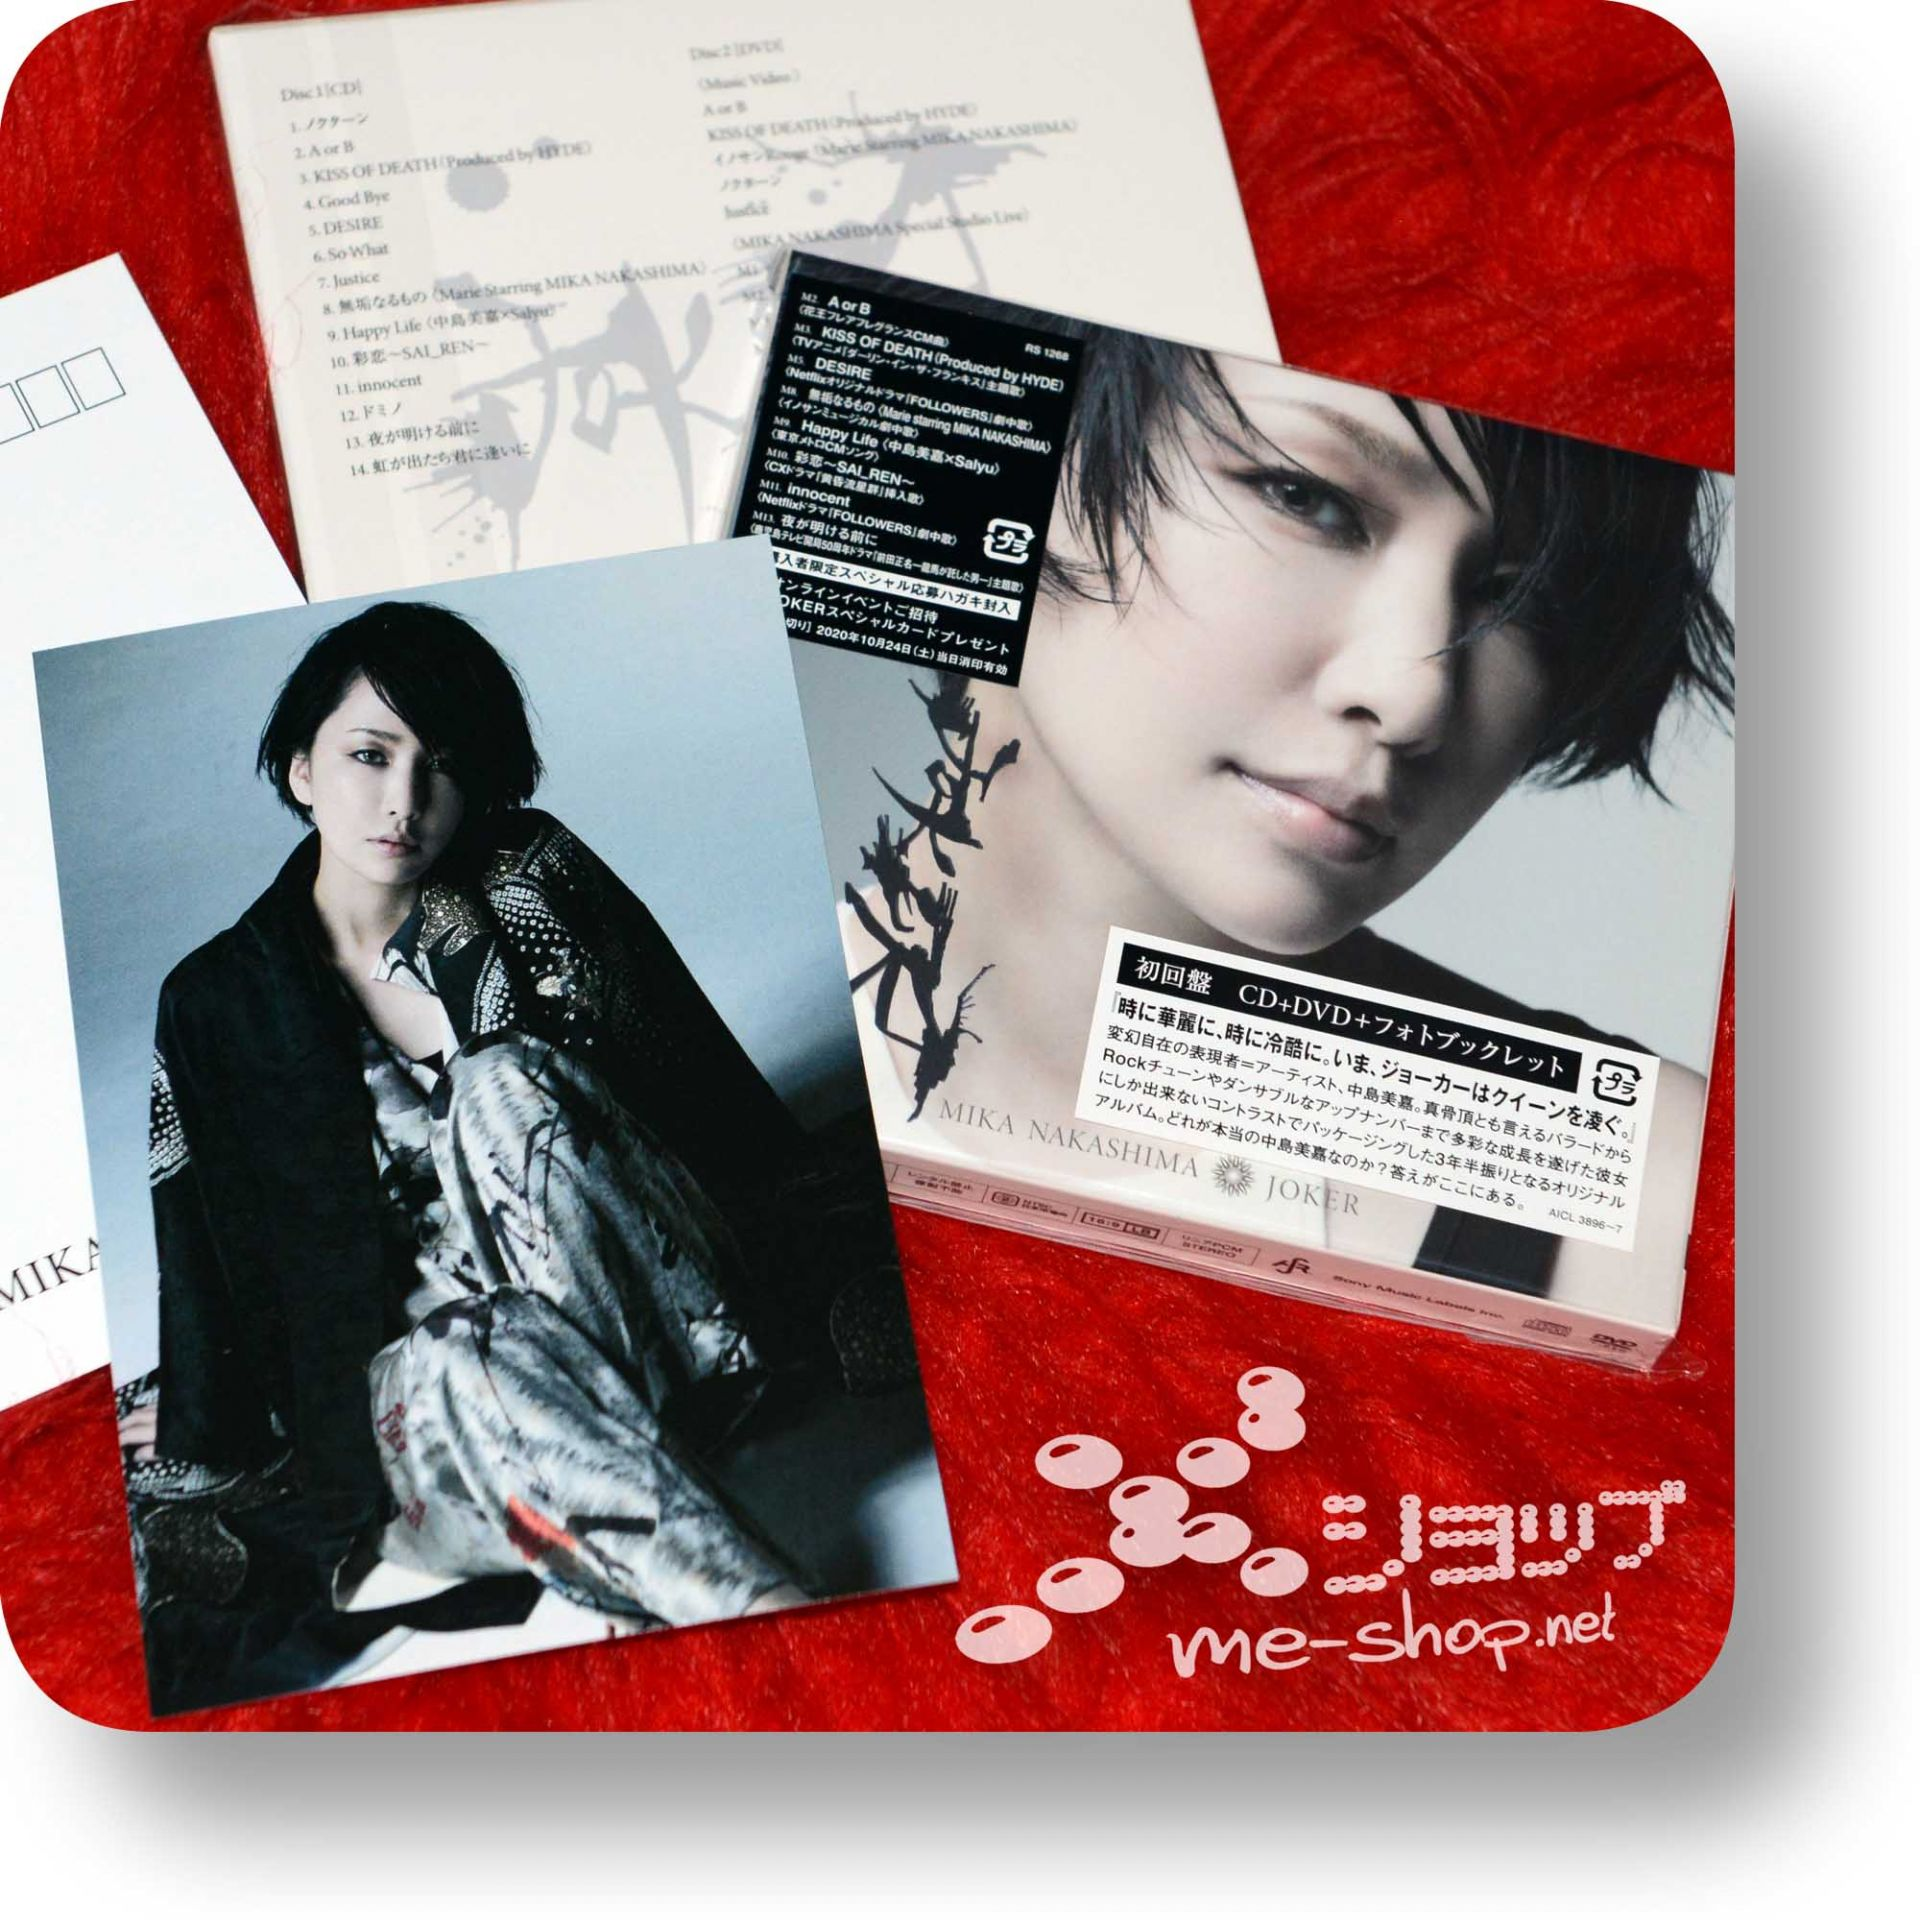 mika nakashima joker cd+dvd+bonus